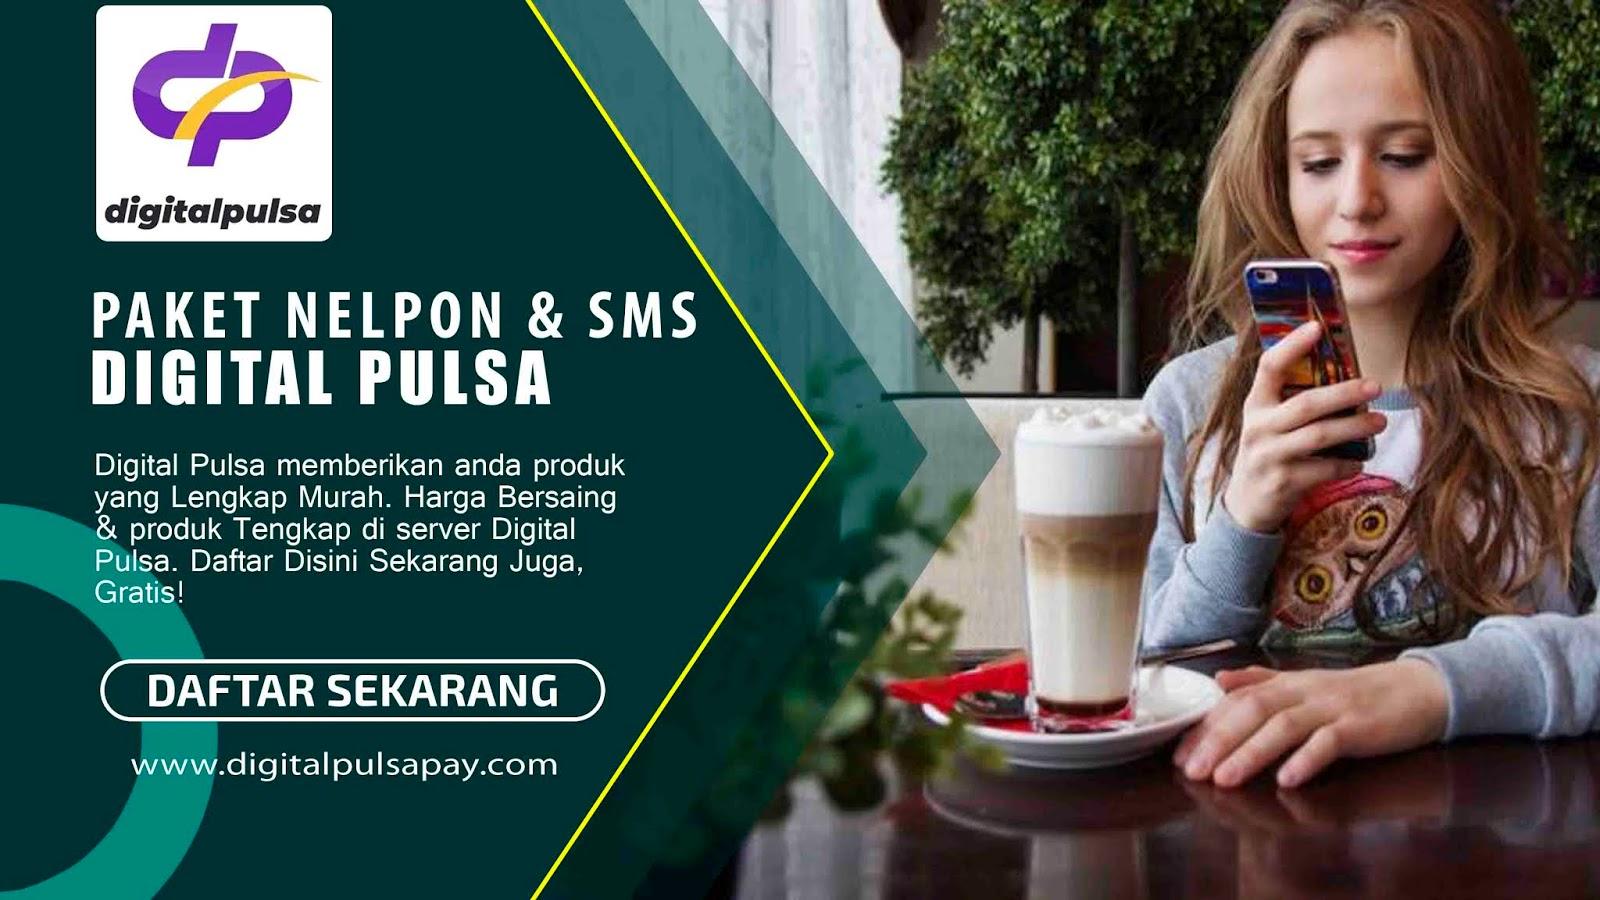 Paket Nelpon dan SMS all Operator Murah, Digital Pulsa